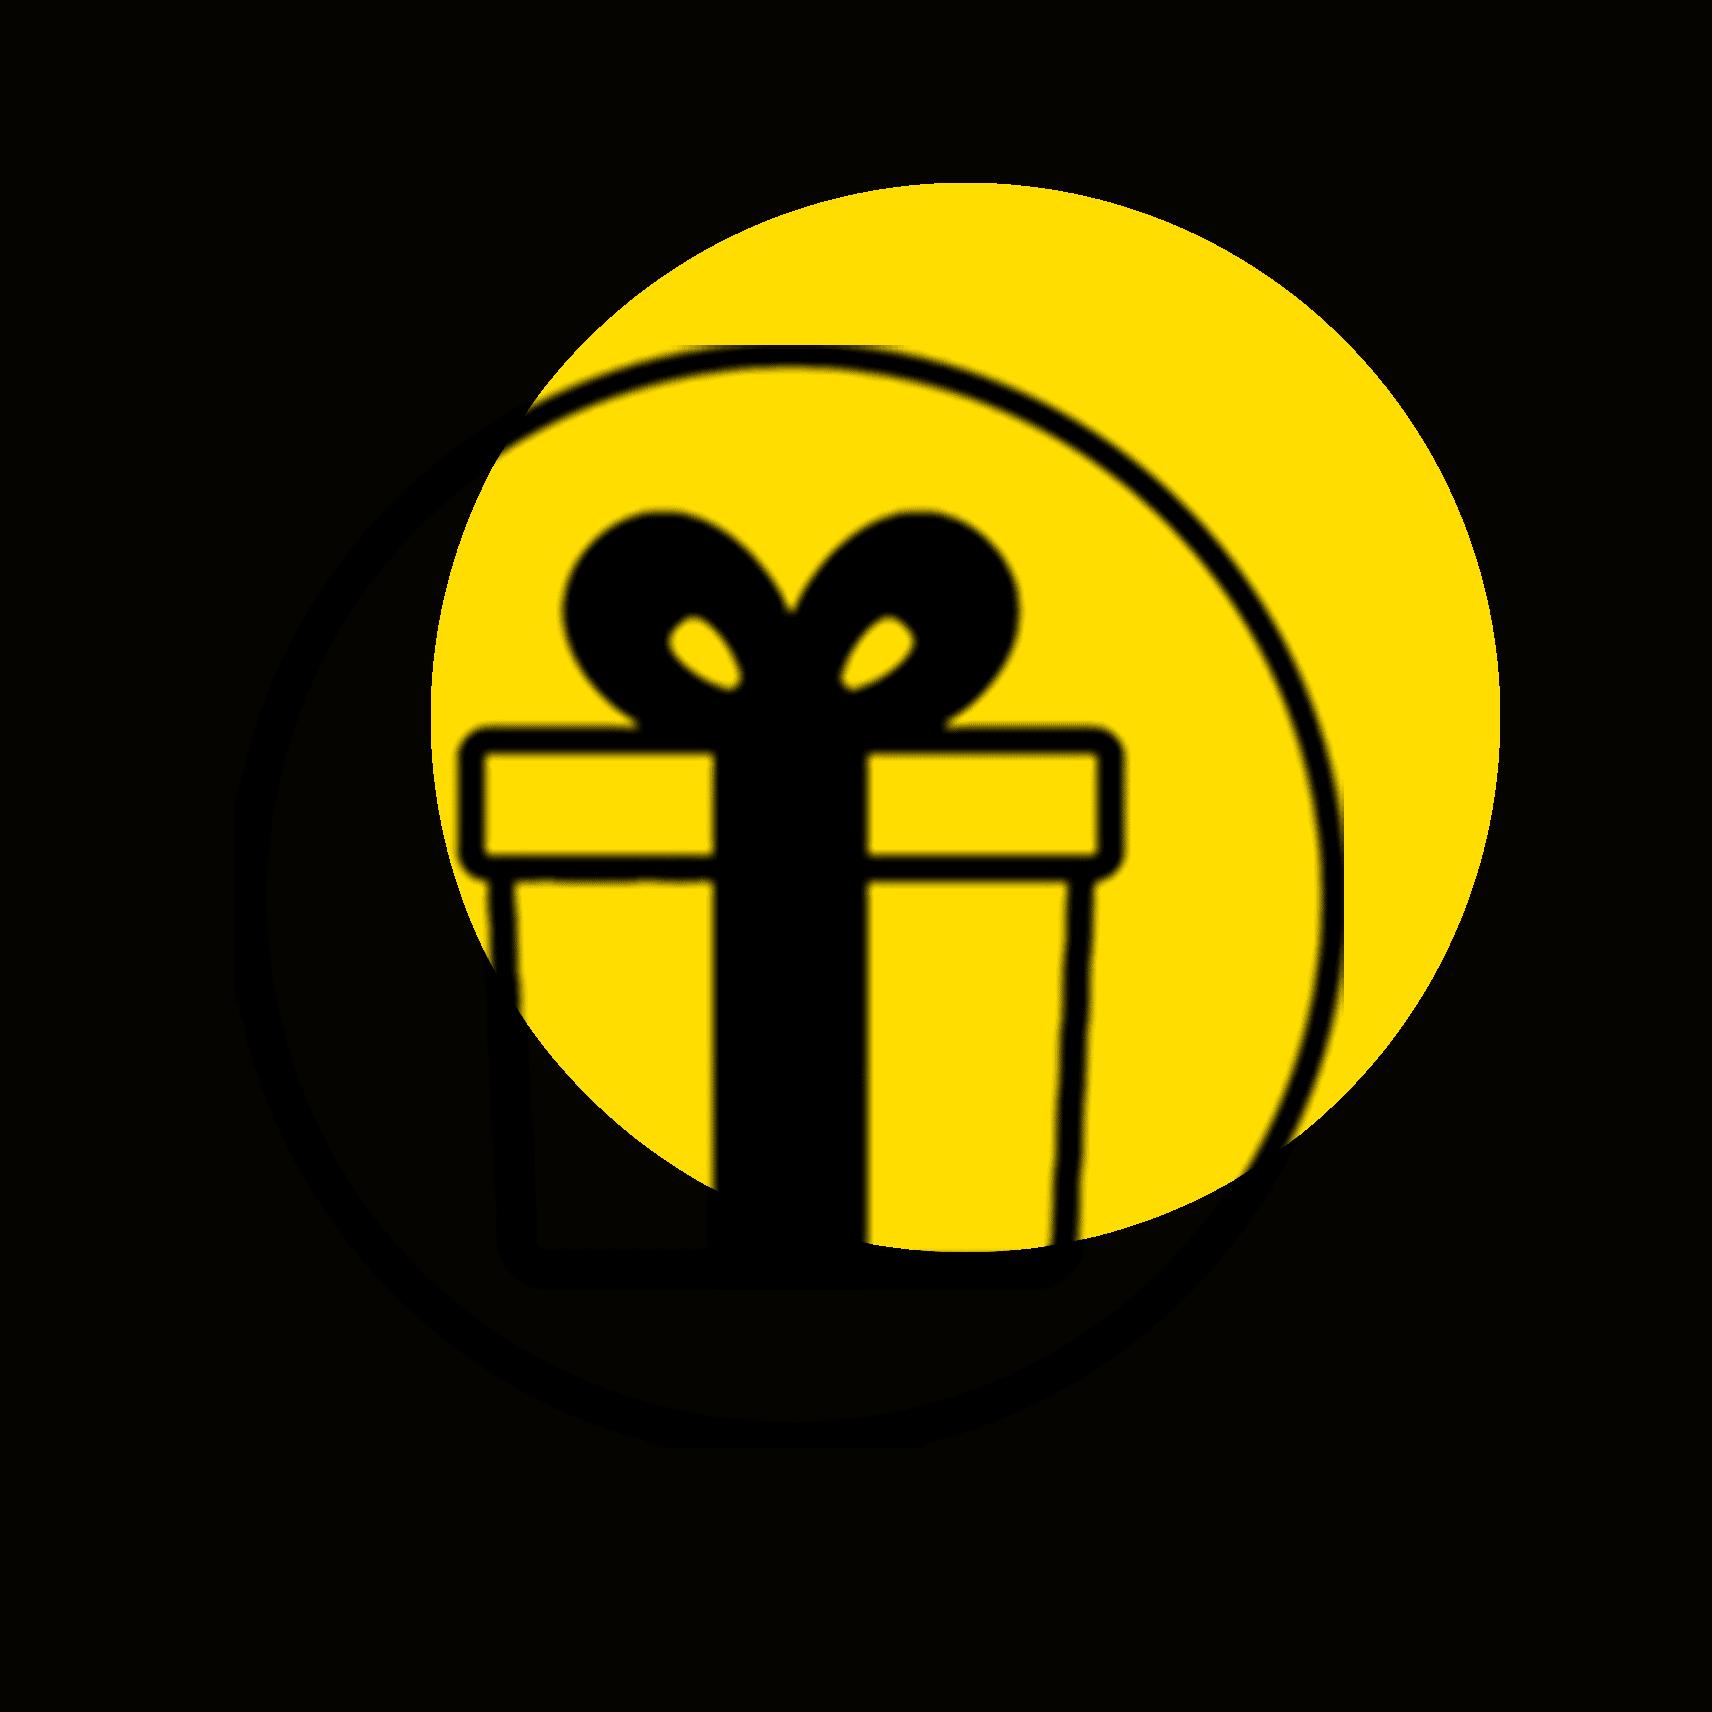 Gift Shop Icon